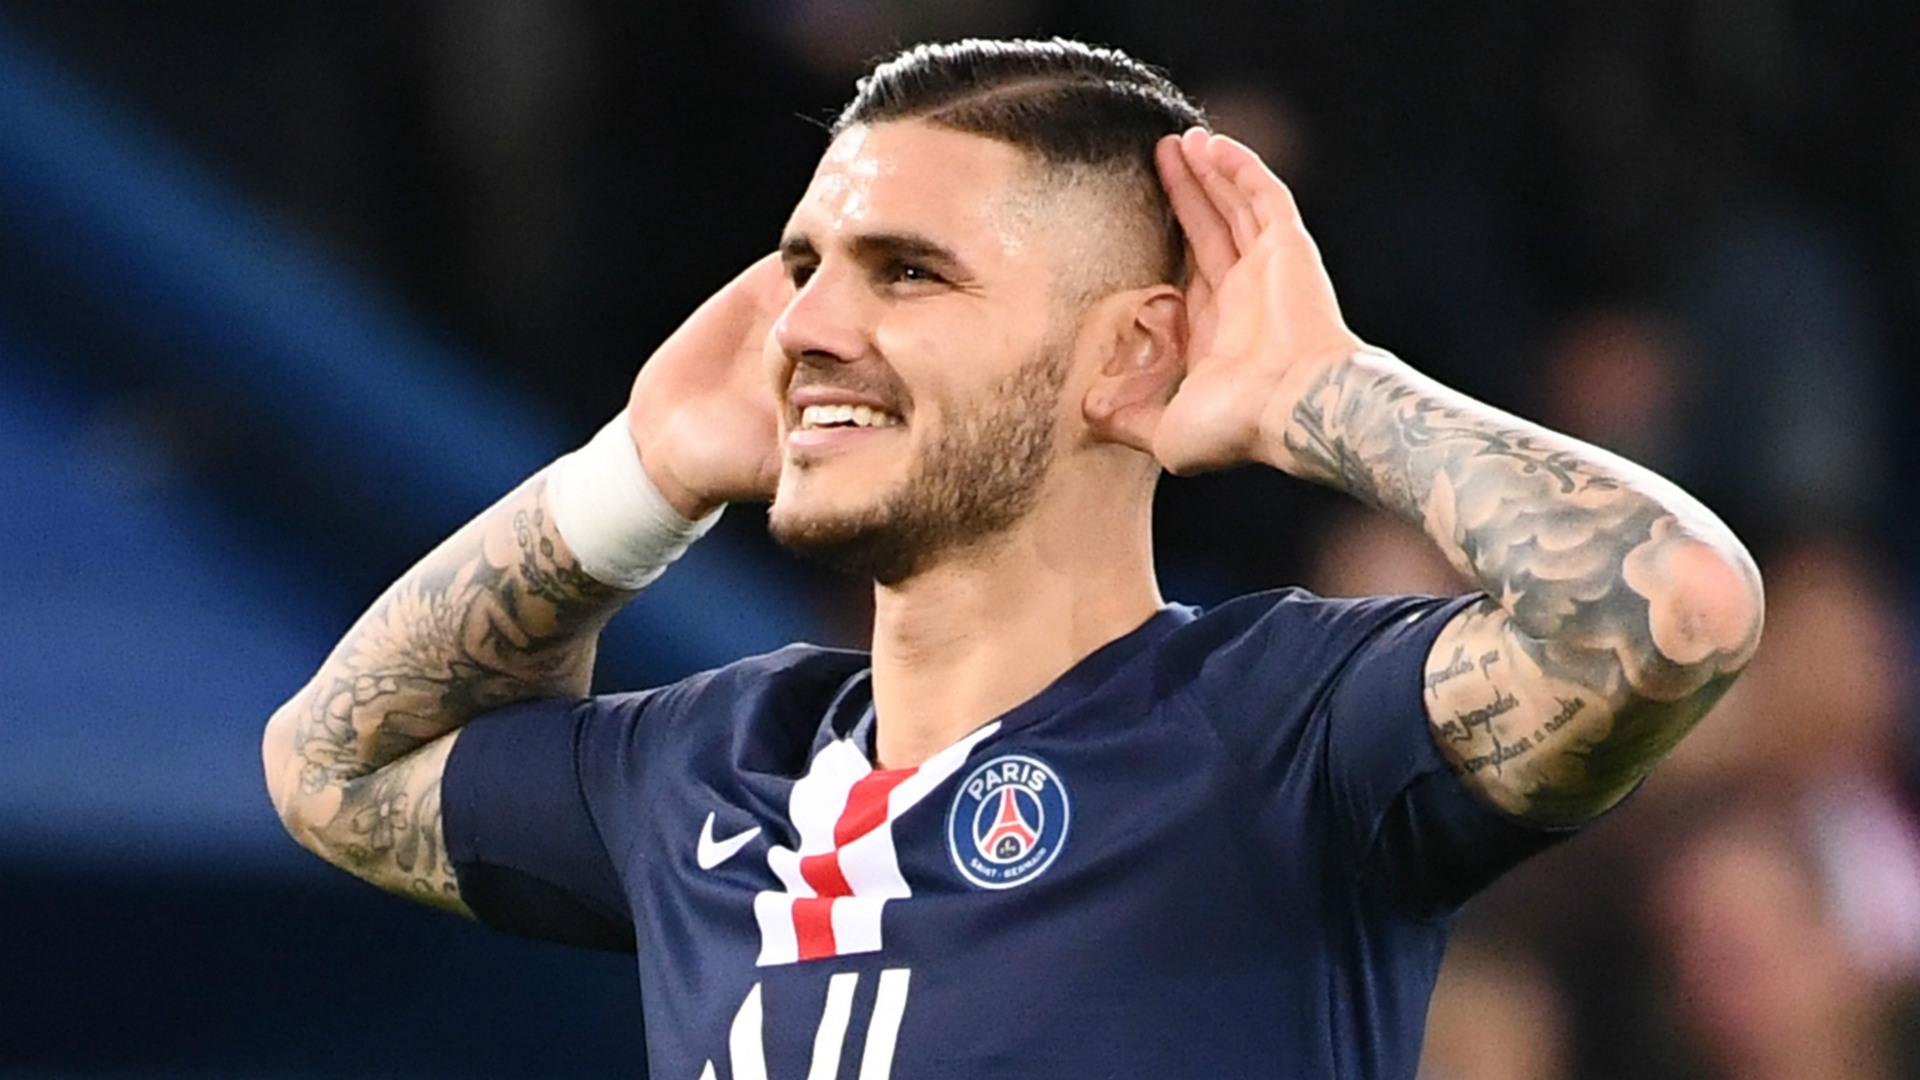 mauro icardi psg paris saint germain 2019 20 o57csvx7ozla1ir0anedlmph8 - Transfer news and rumours LIVE: PSG make €50m offer for Icardi